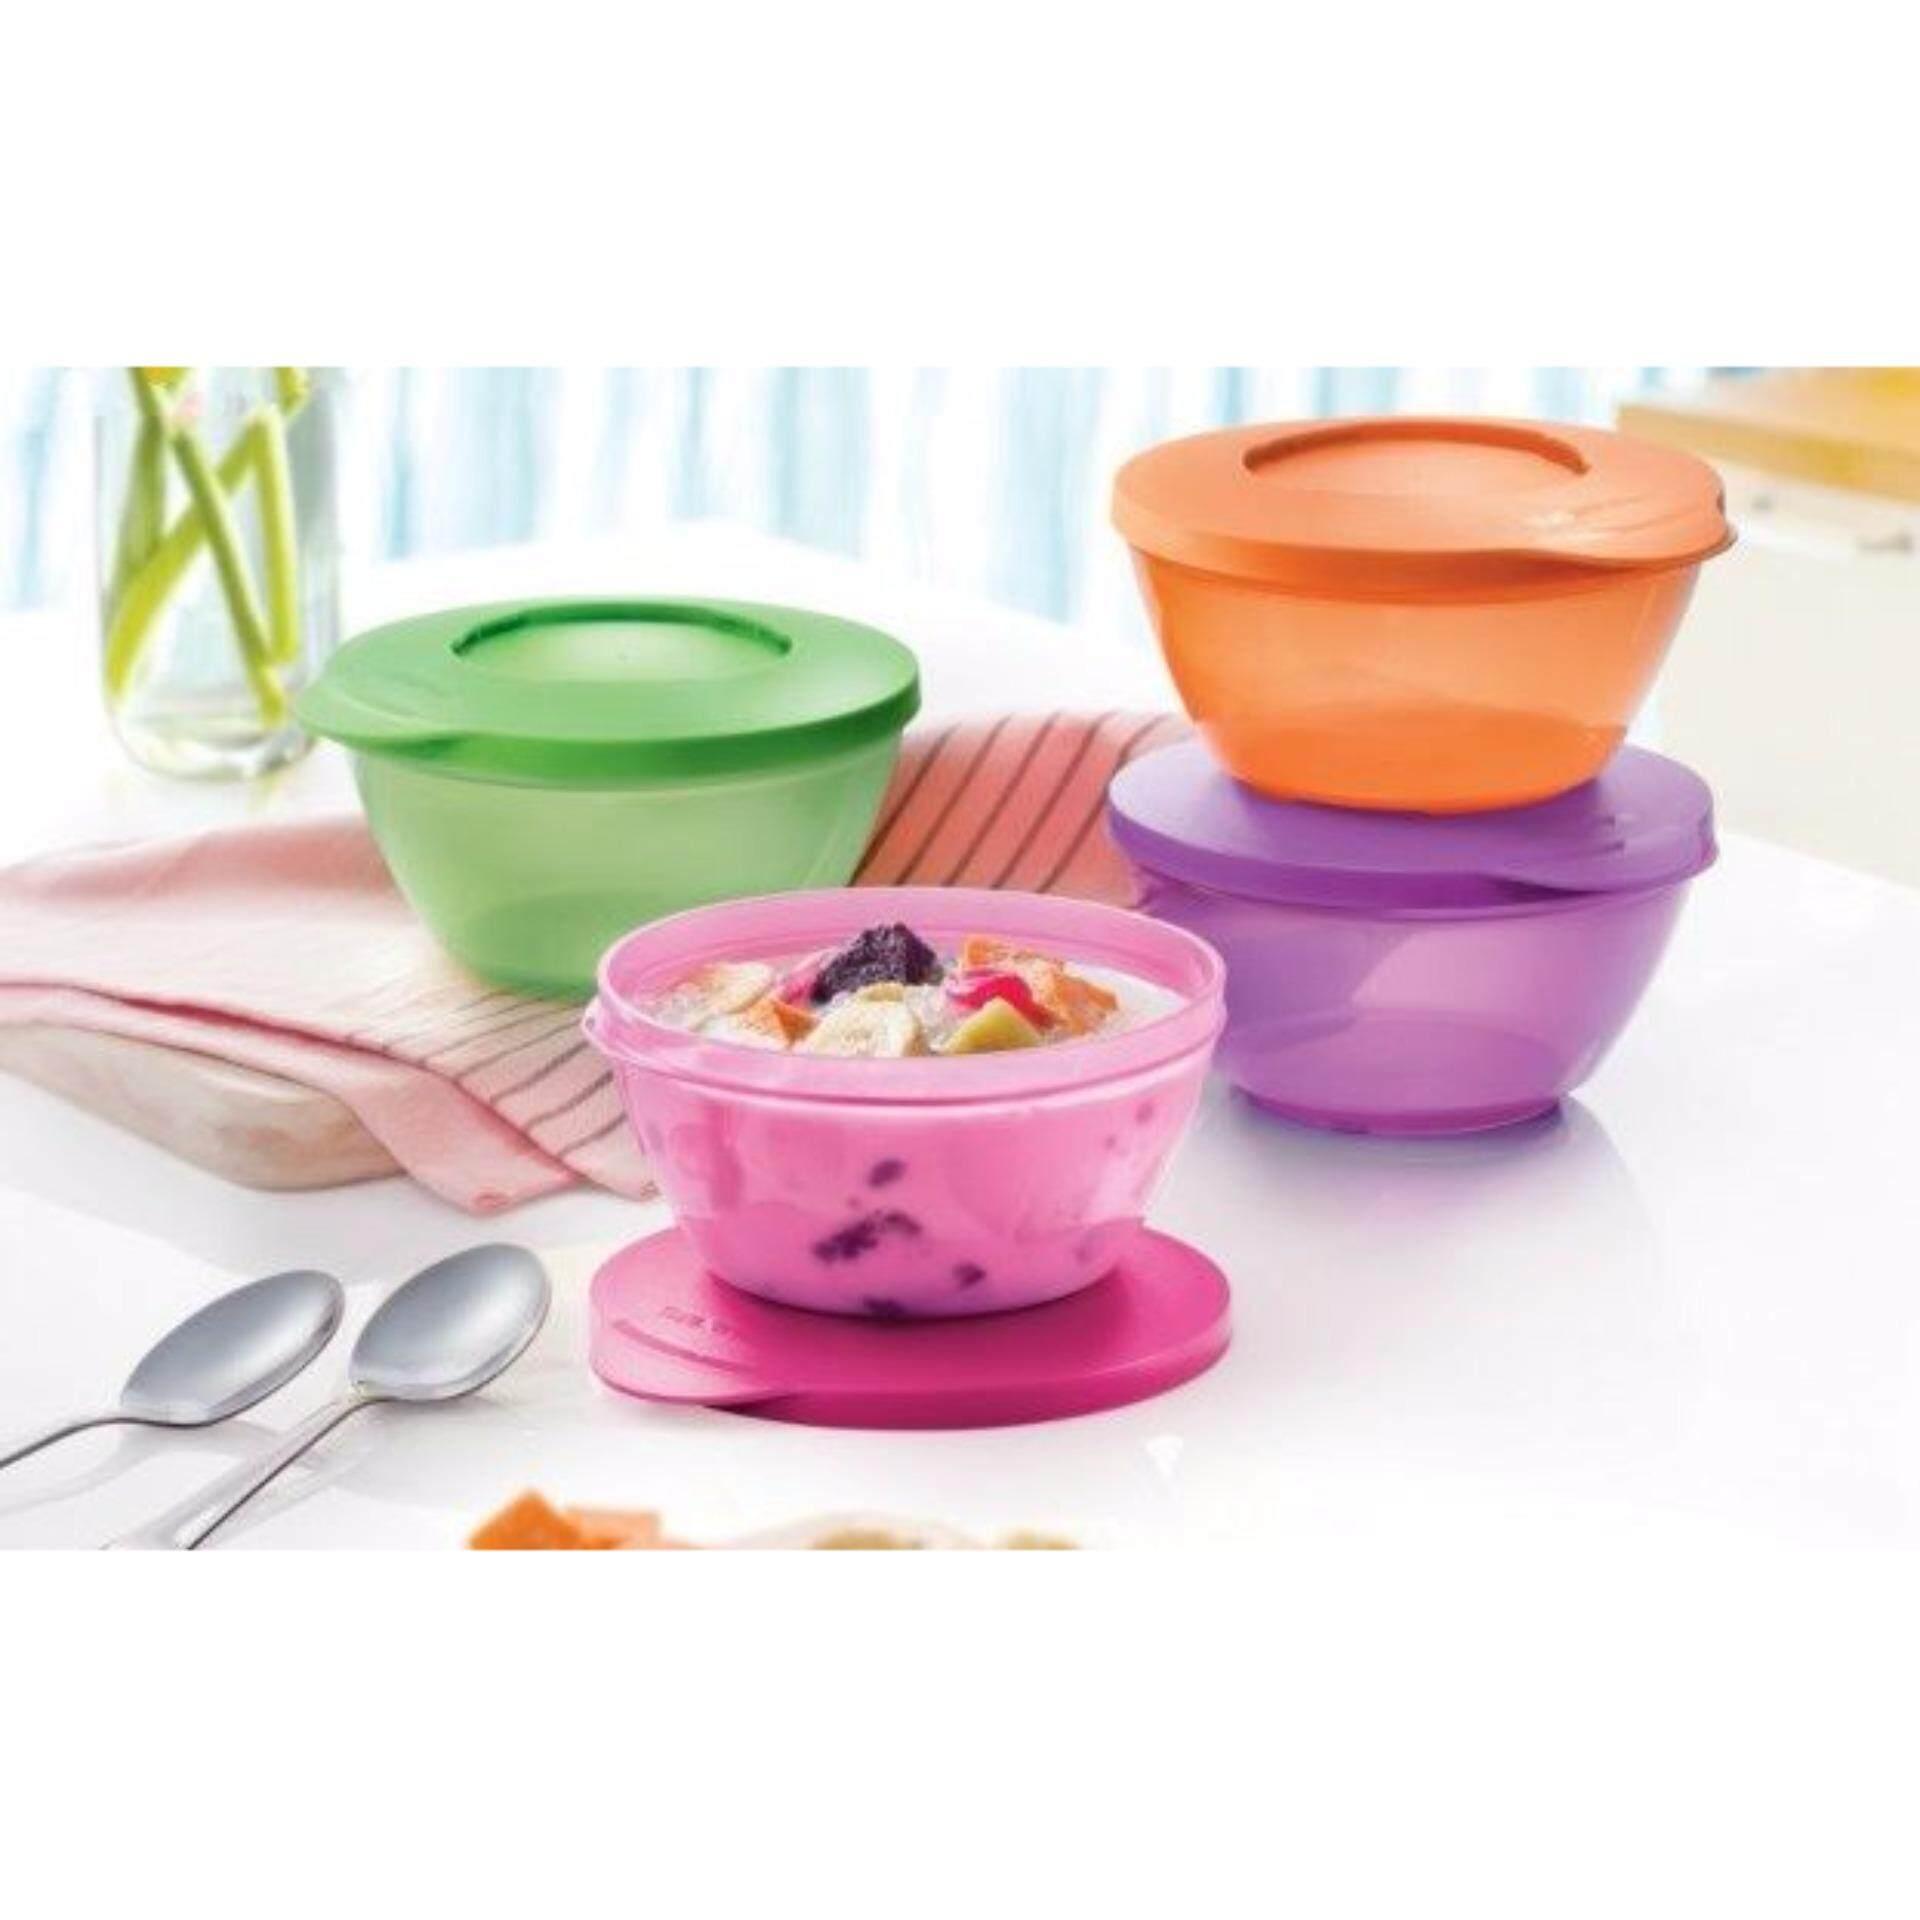 Tupperware Click Bowls (1)pc 425ml Only - Random Color Send